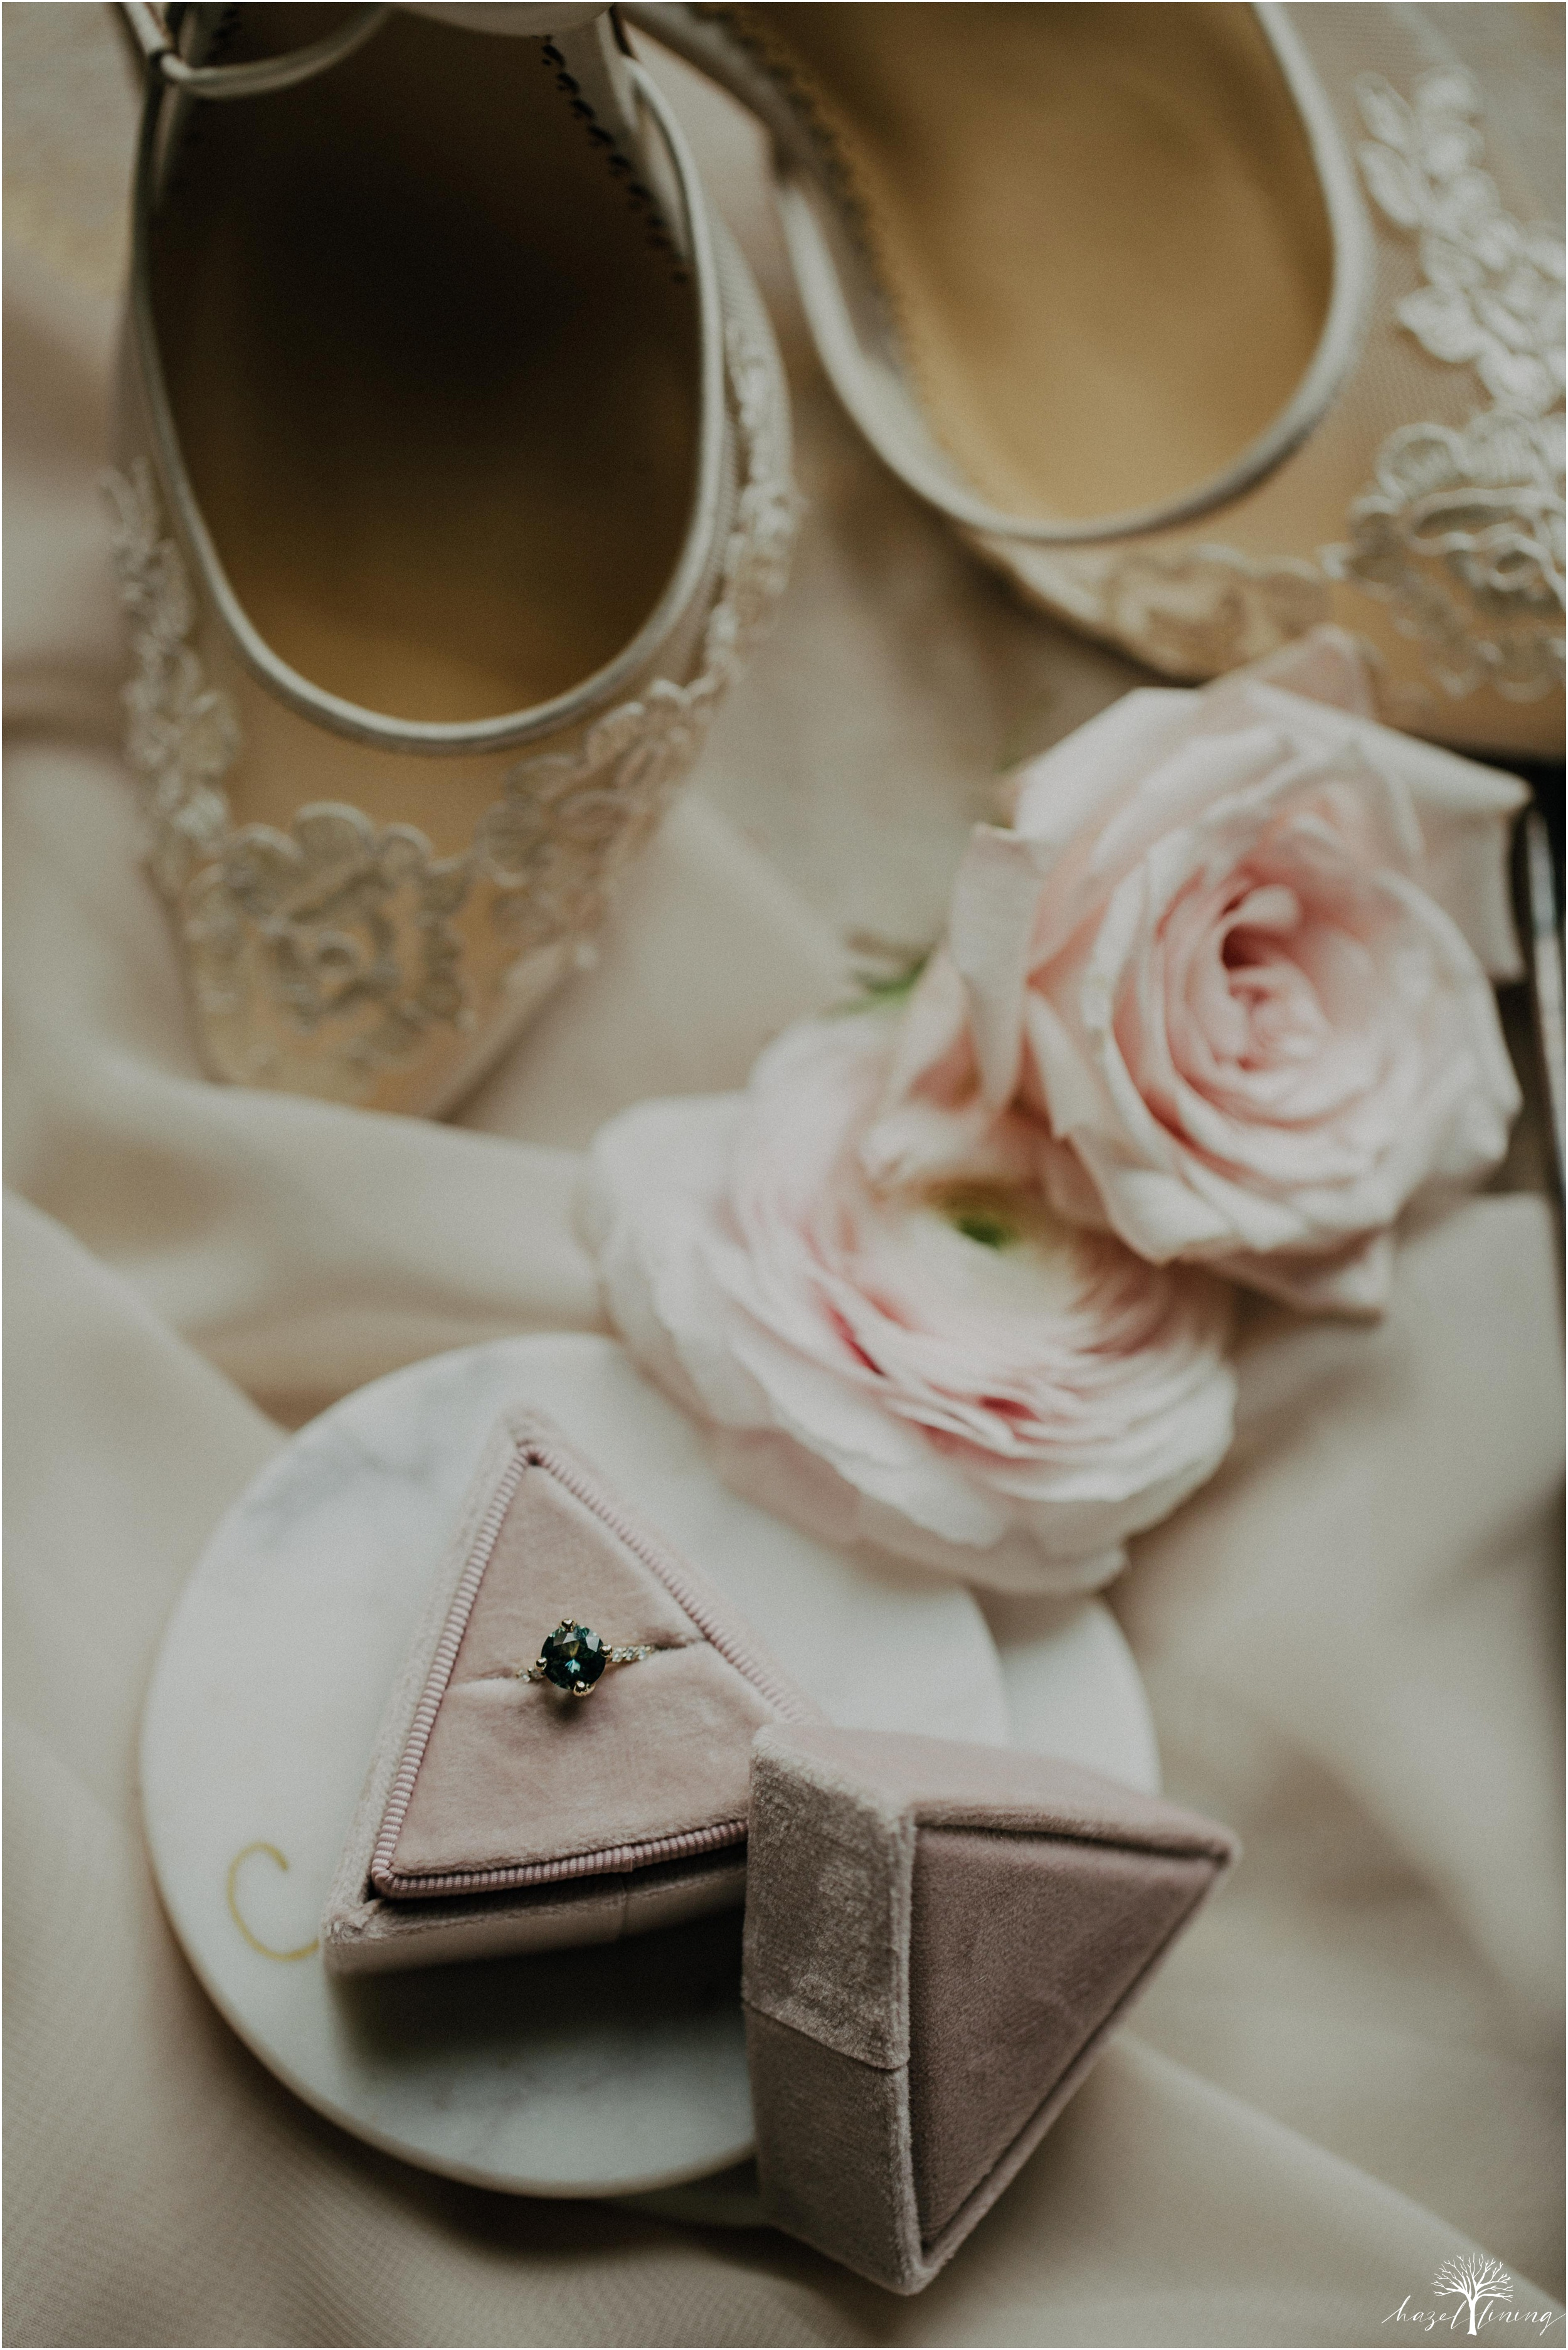 carl-chloe-the-ryland-inn-whitehouse-station-new-jersey-styled-squad-hazel-lining-photography-destination-elopement-wedding-engagement-photography_0006.jpg